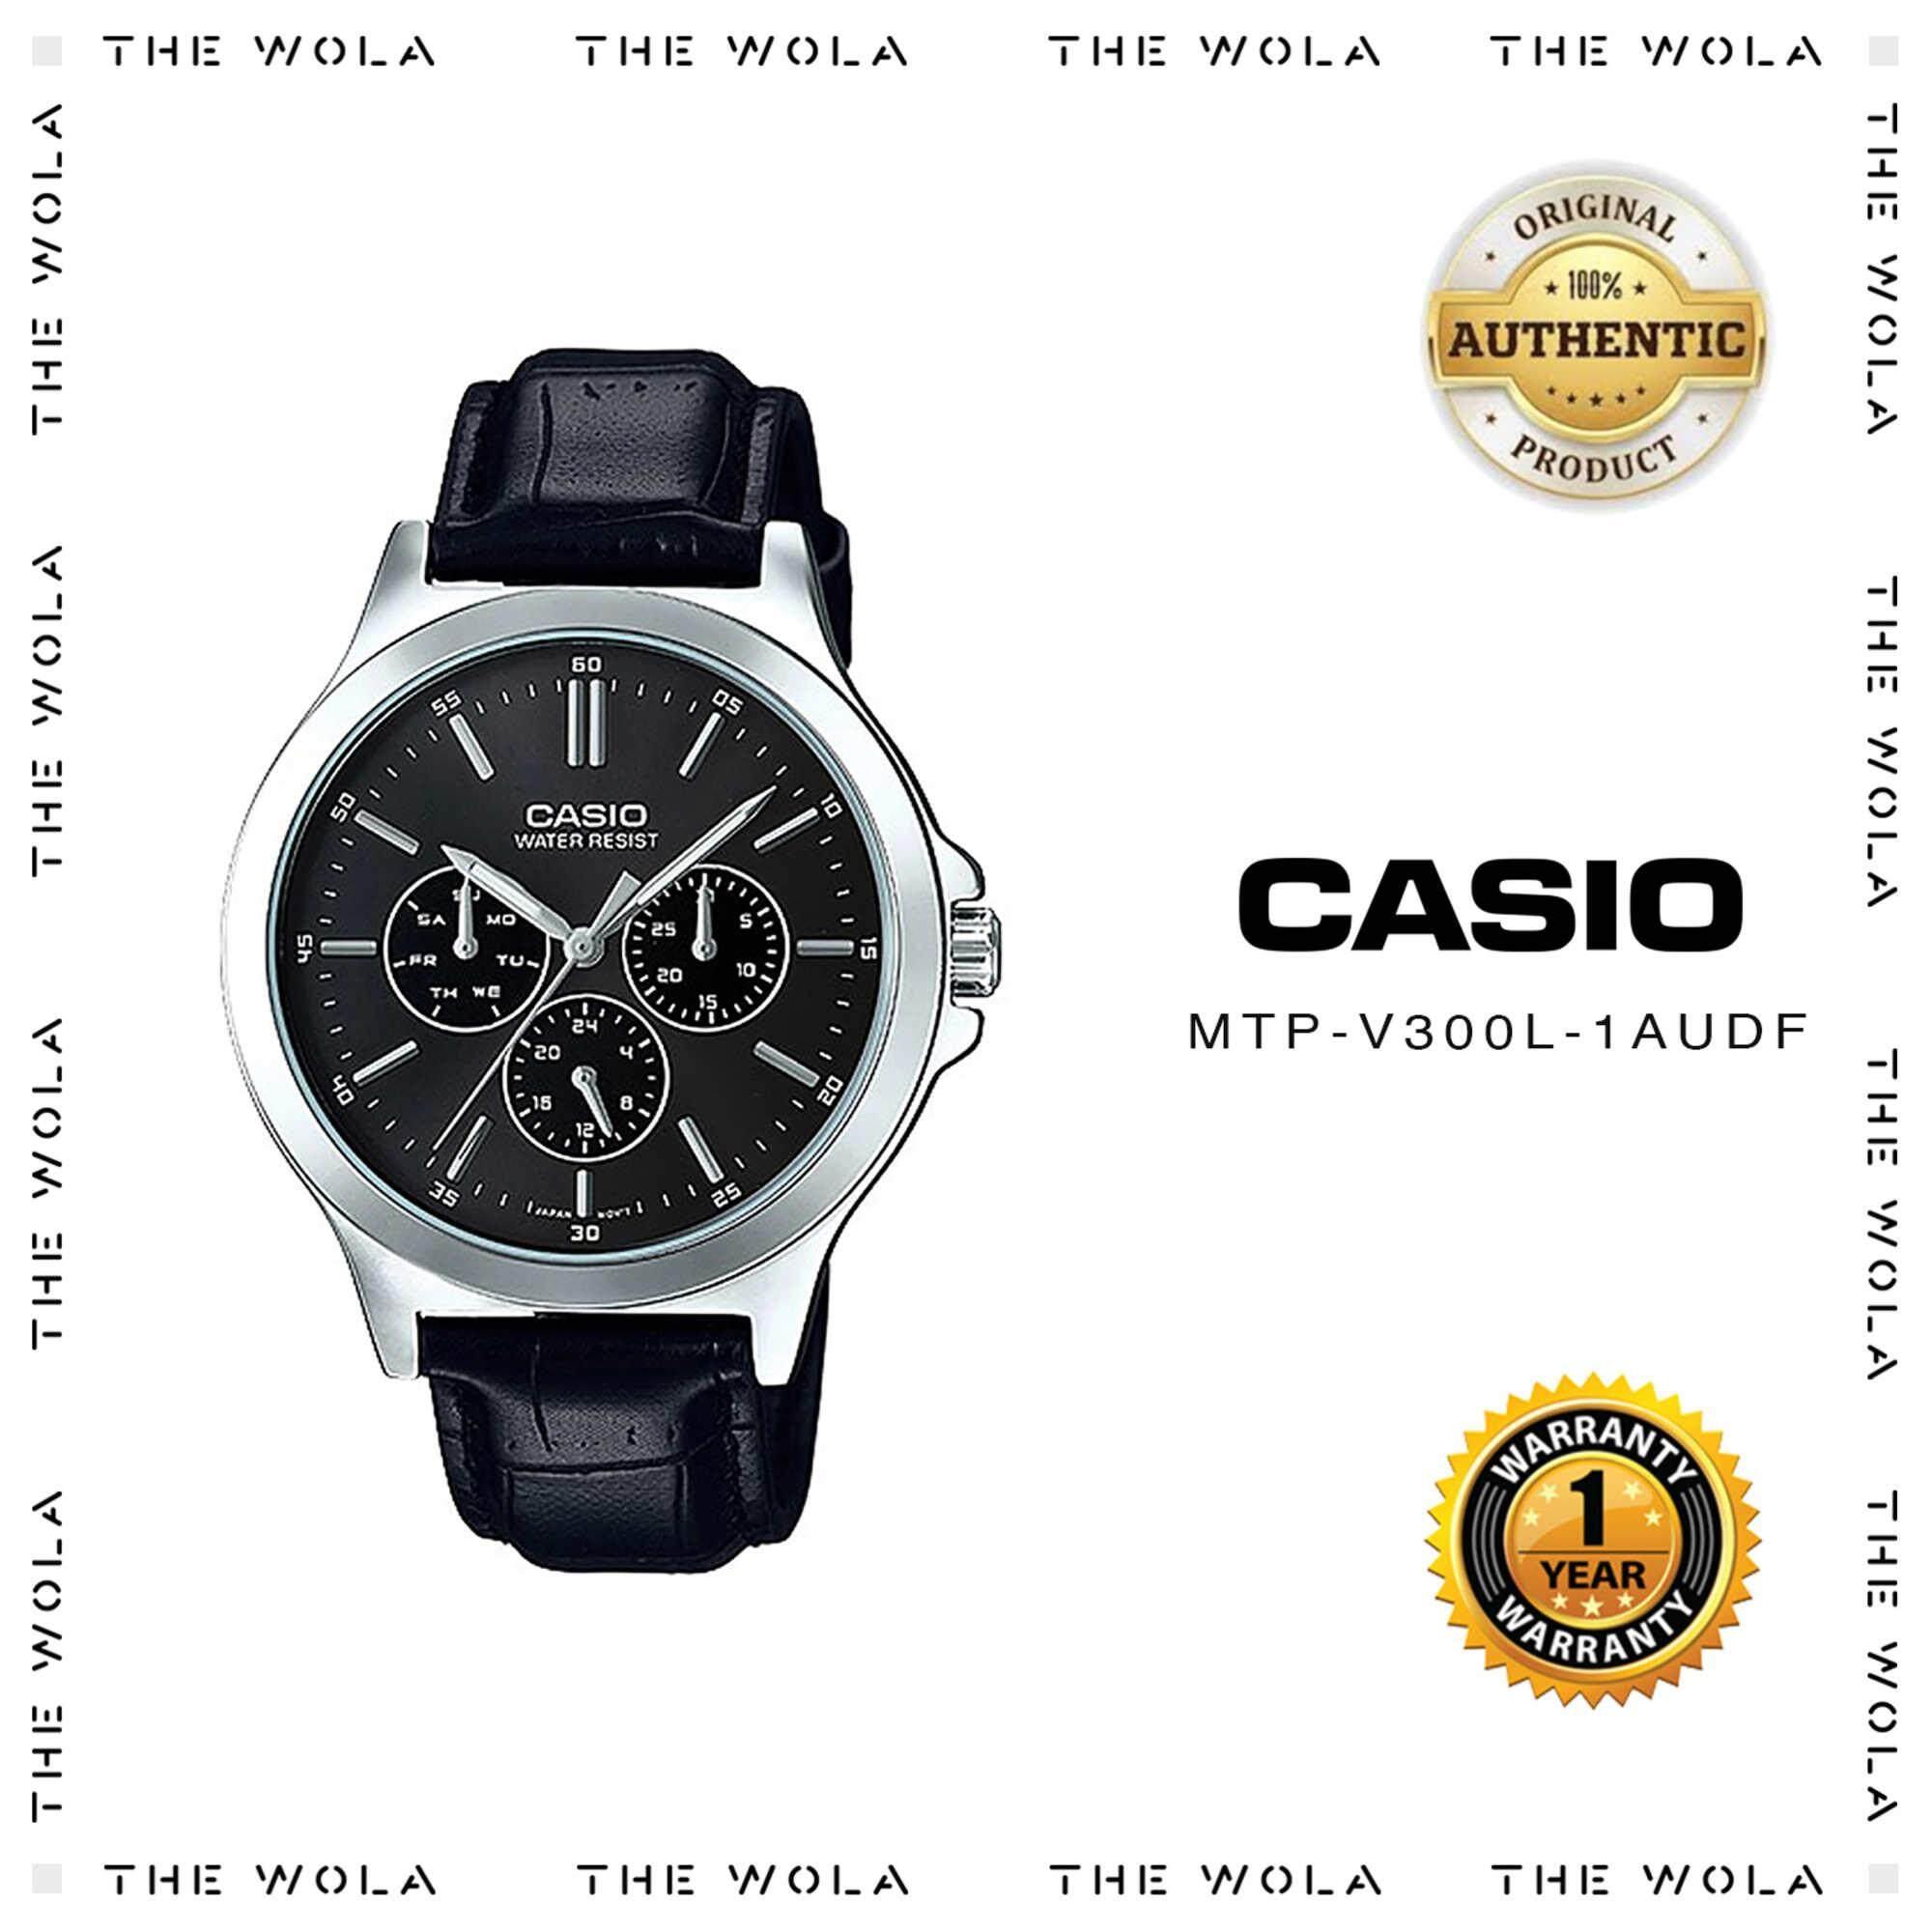 Vivienne Westwood,Adidas,ROXY,Casio,GS Polo - Buy Vivienne Westwood